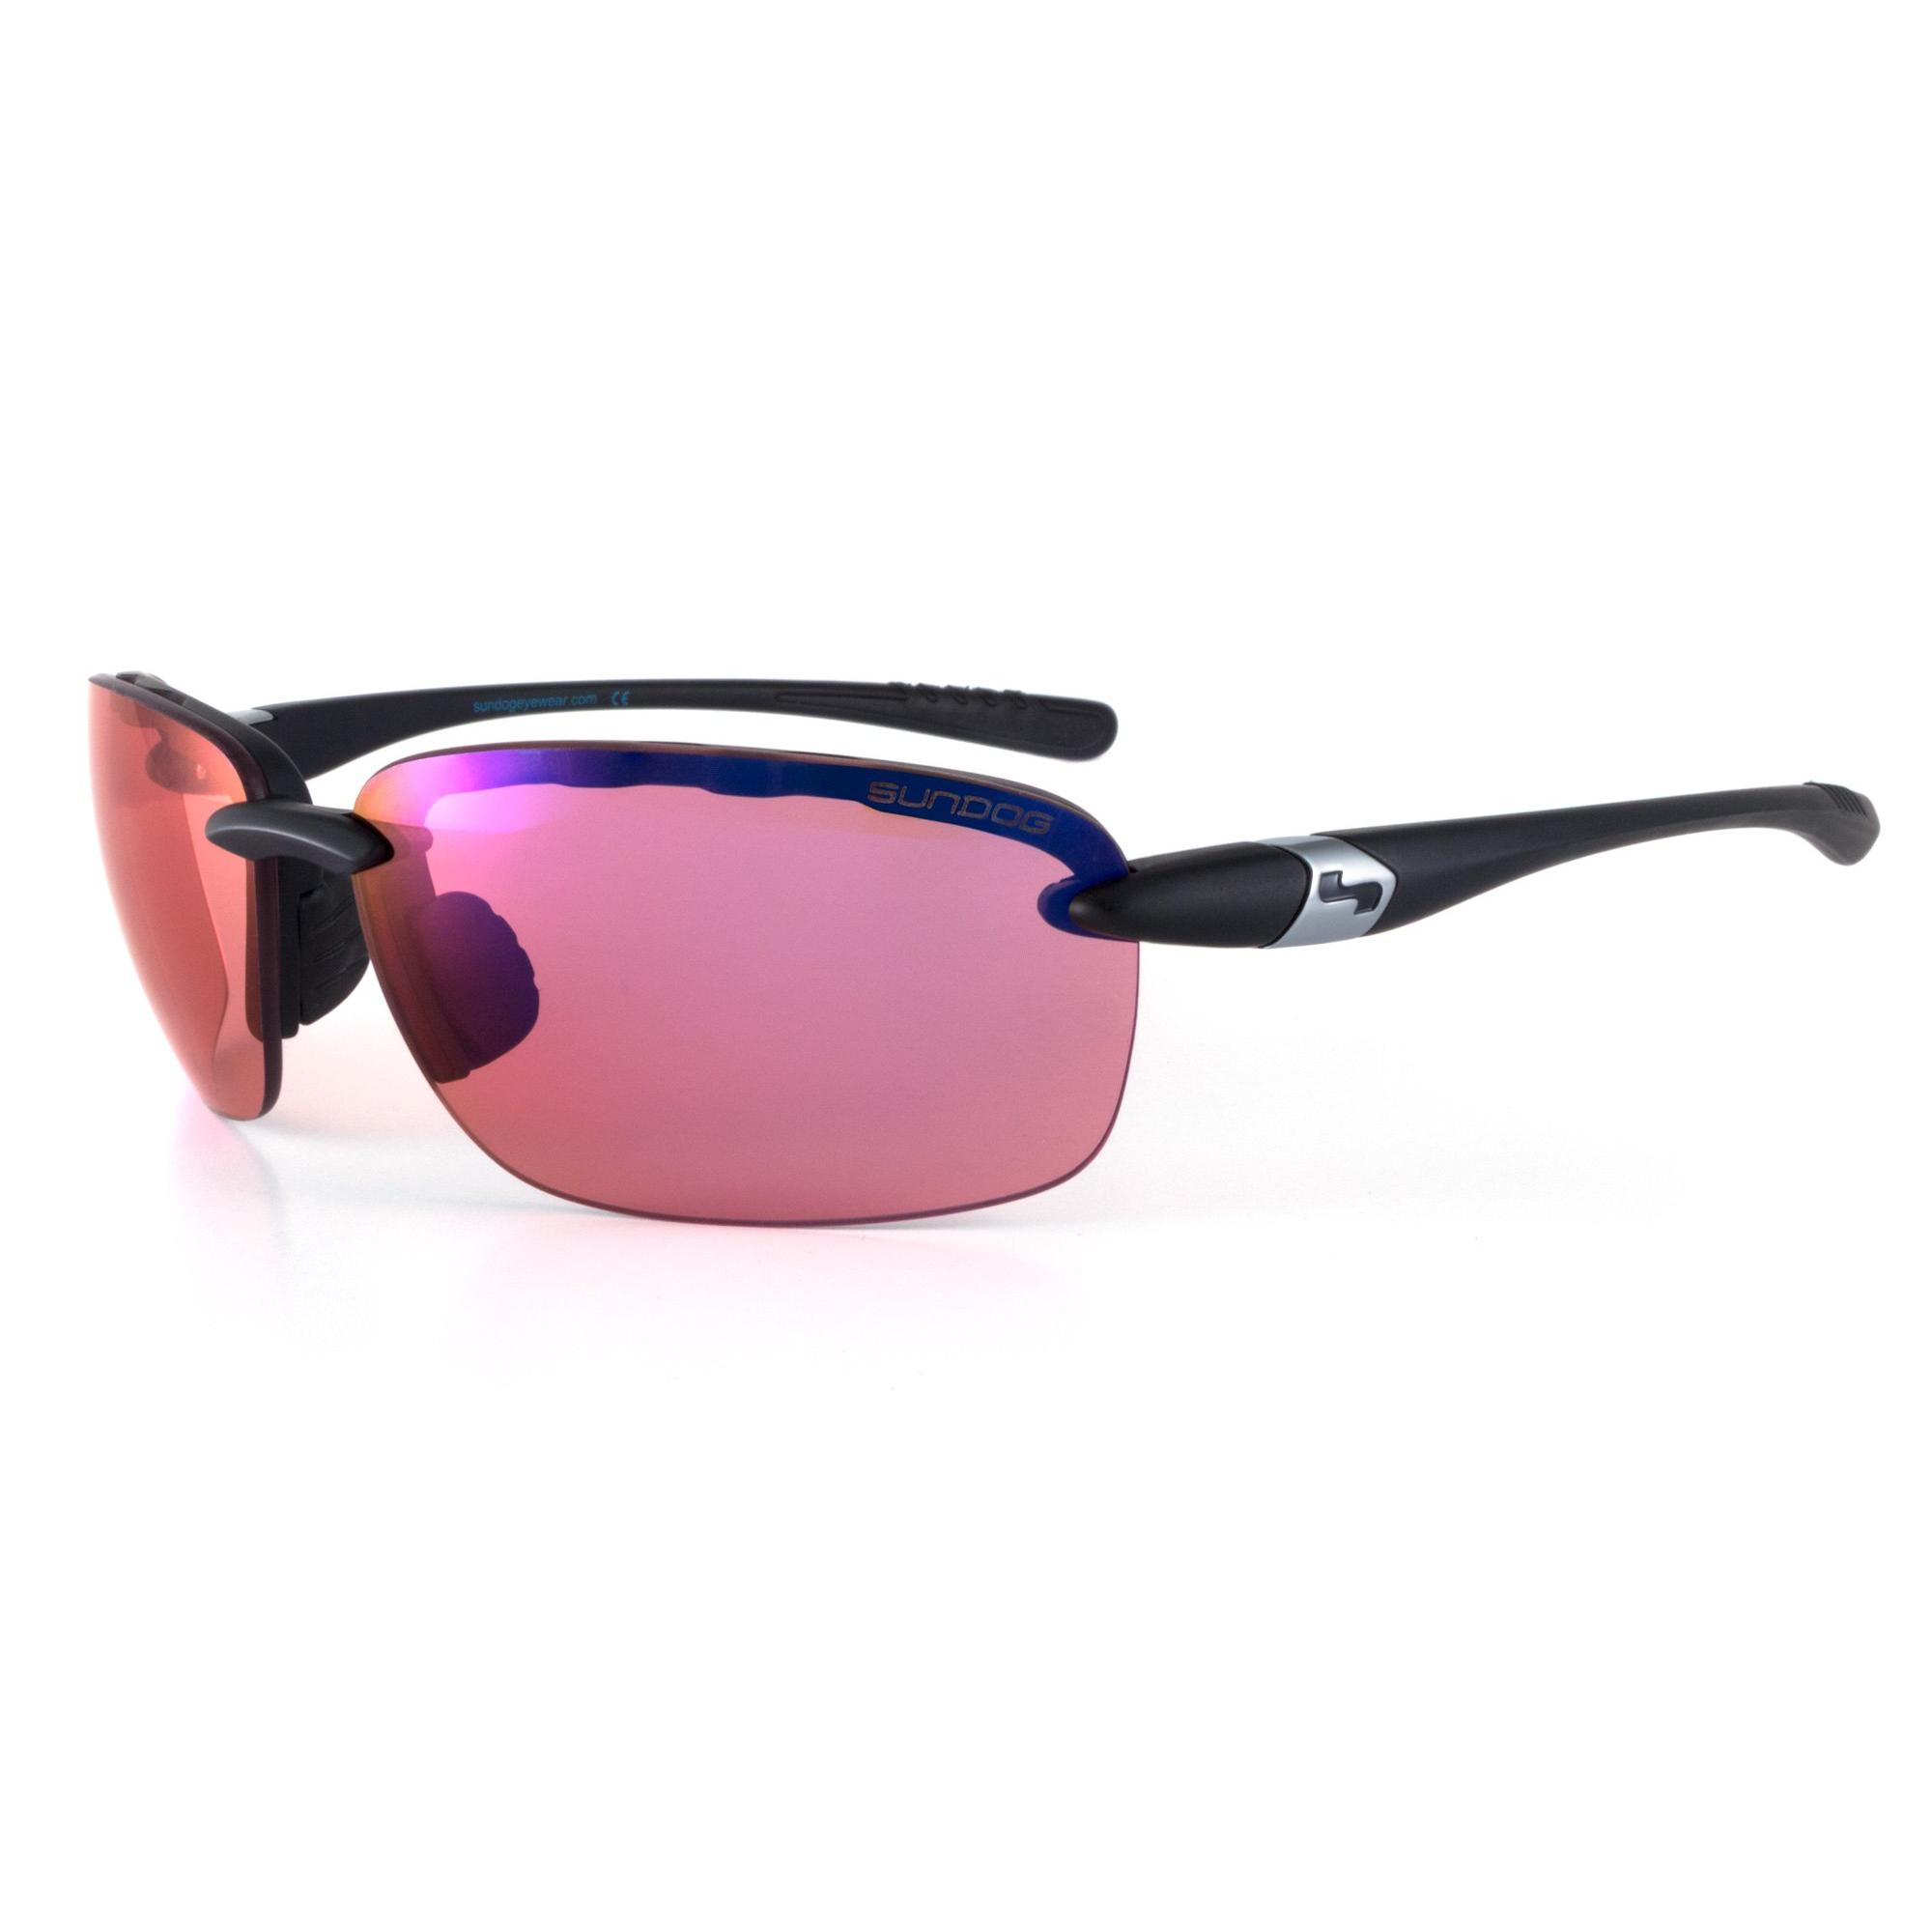 Men's Laser II TB Sunglasses - Black/Blue